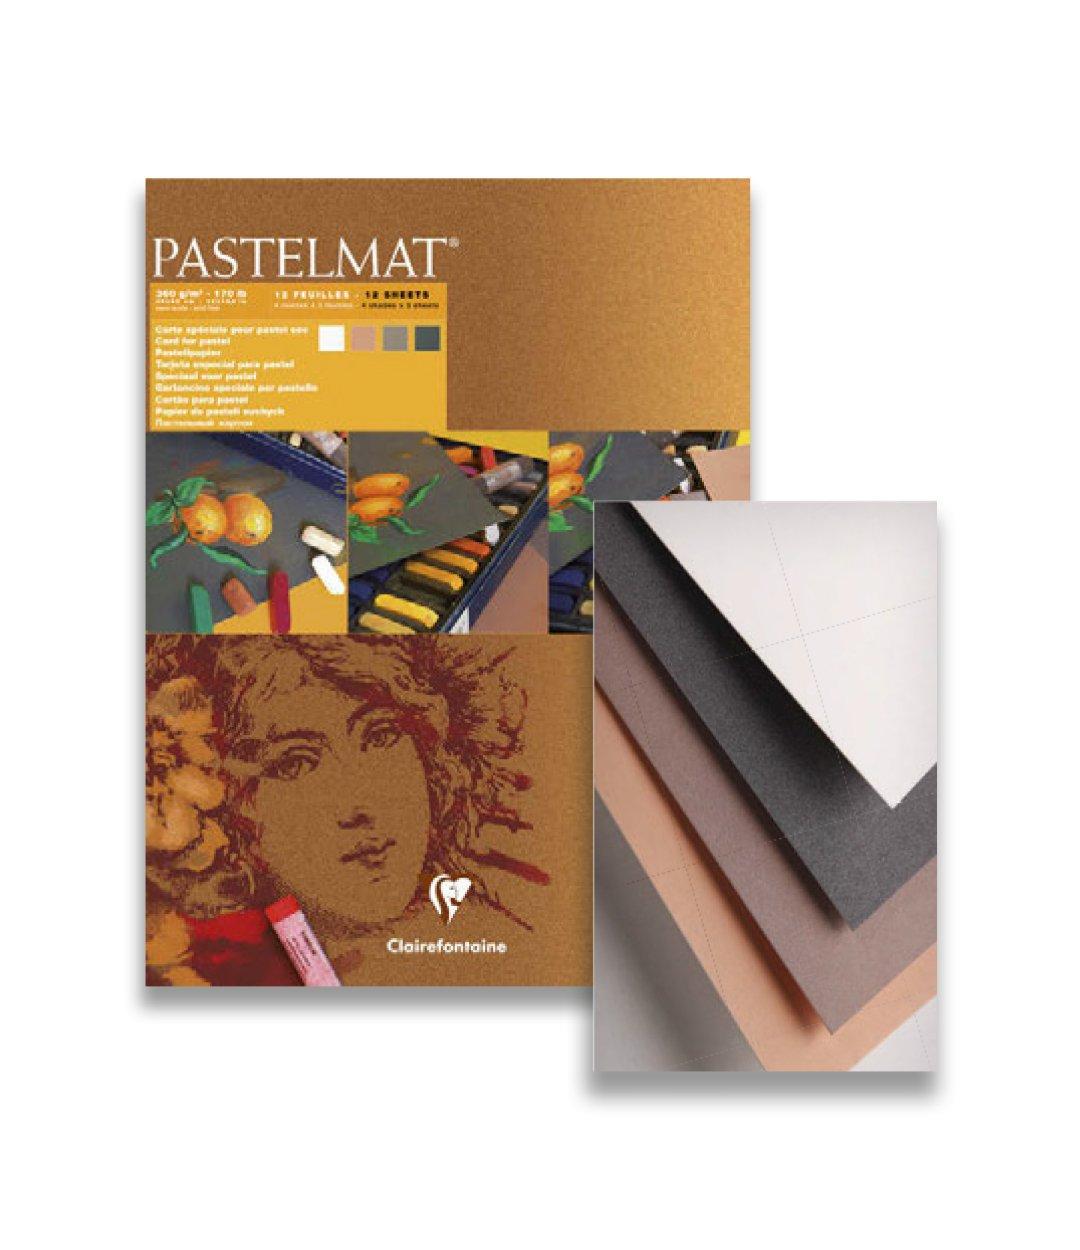 Clairefontaine PastelMat 18 x 24 cm Pastel Card Pad No1, 360 g, Assorted Colours, 12 Sheets 96016C